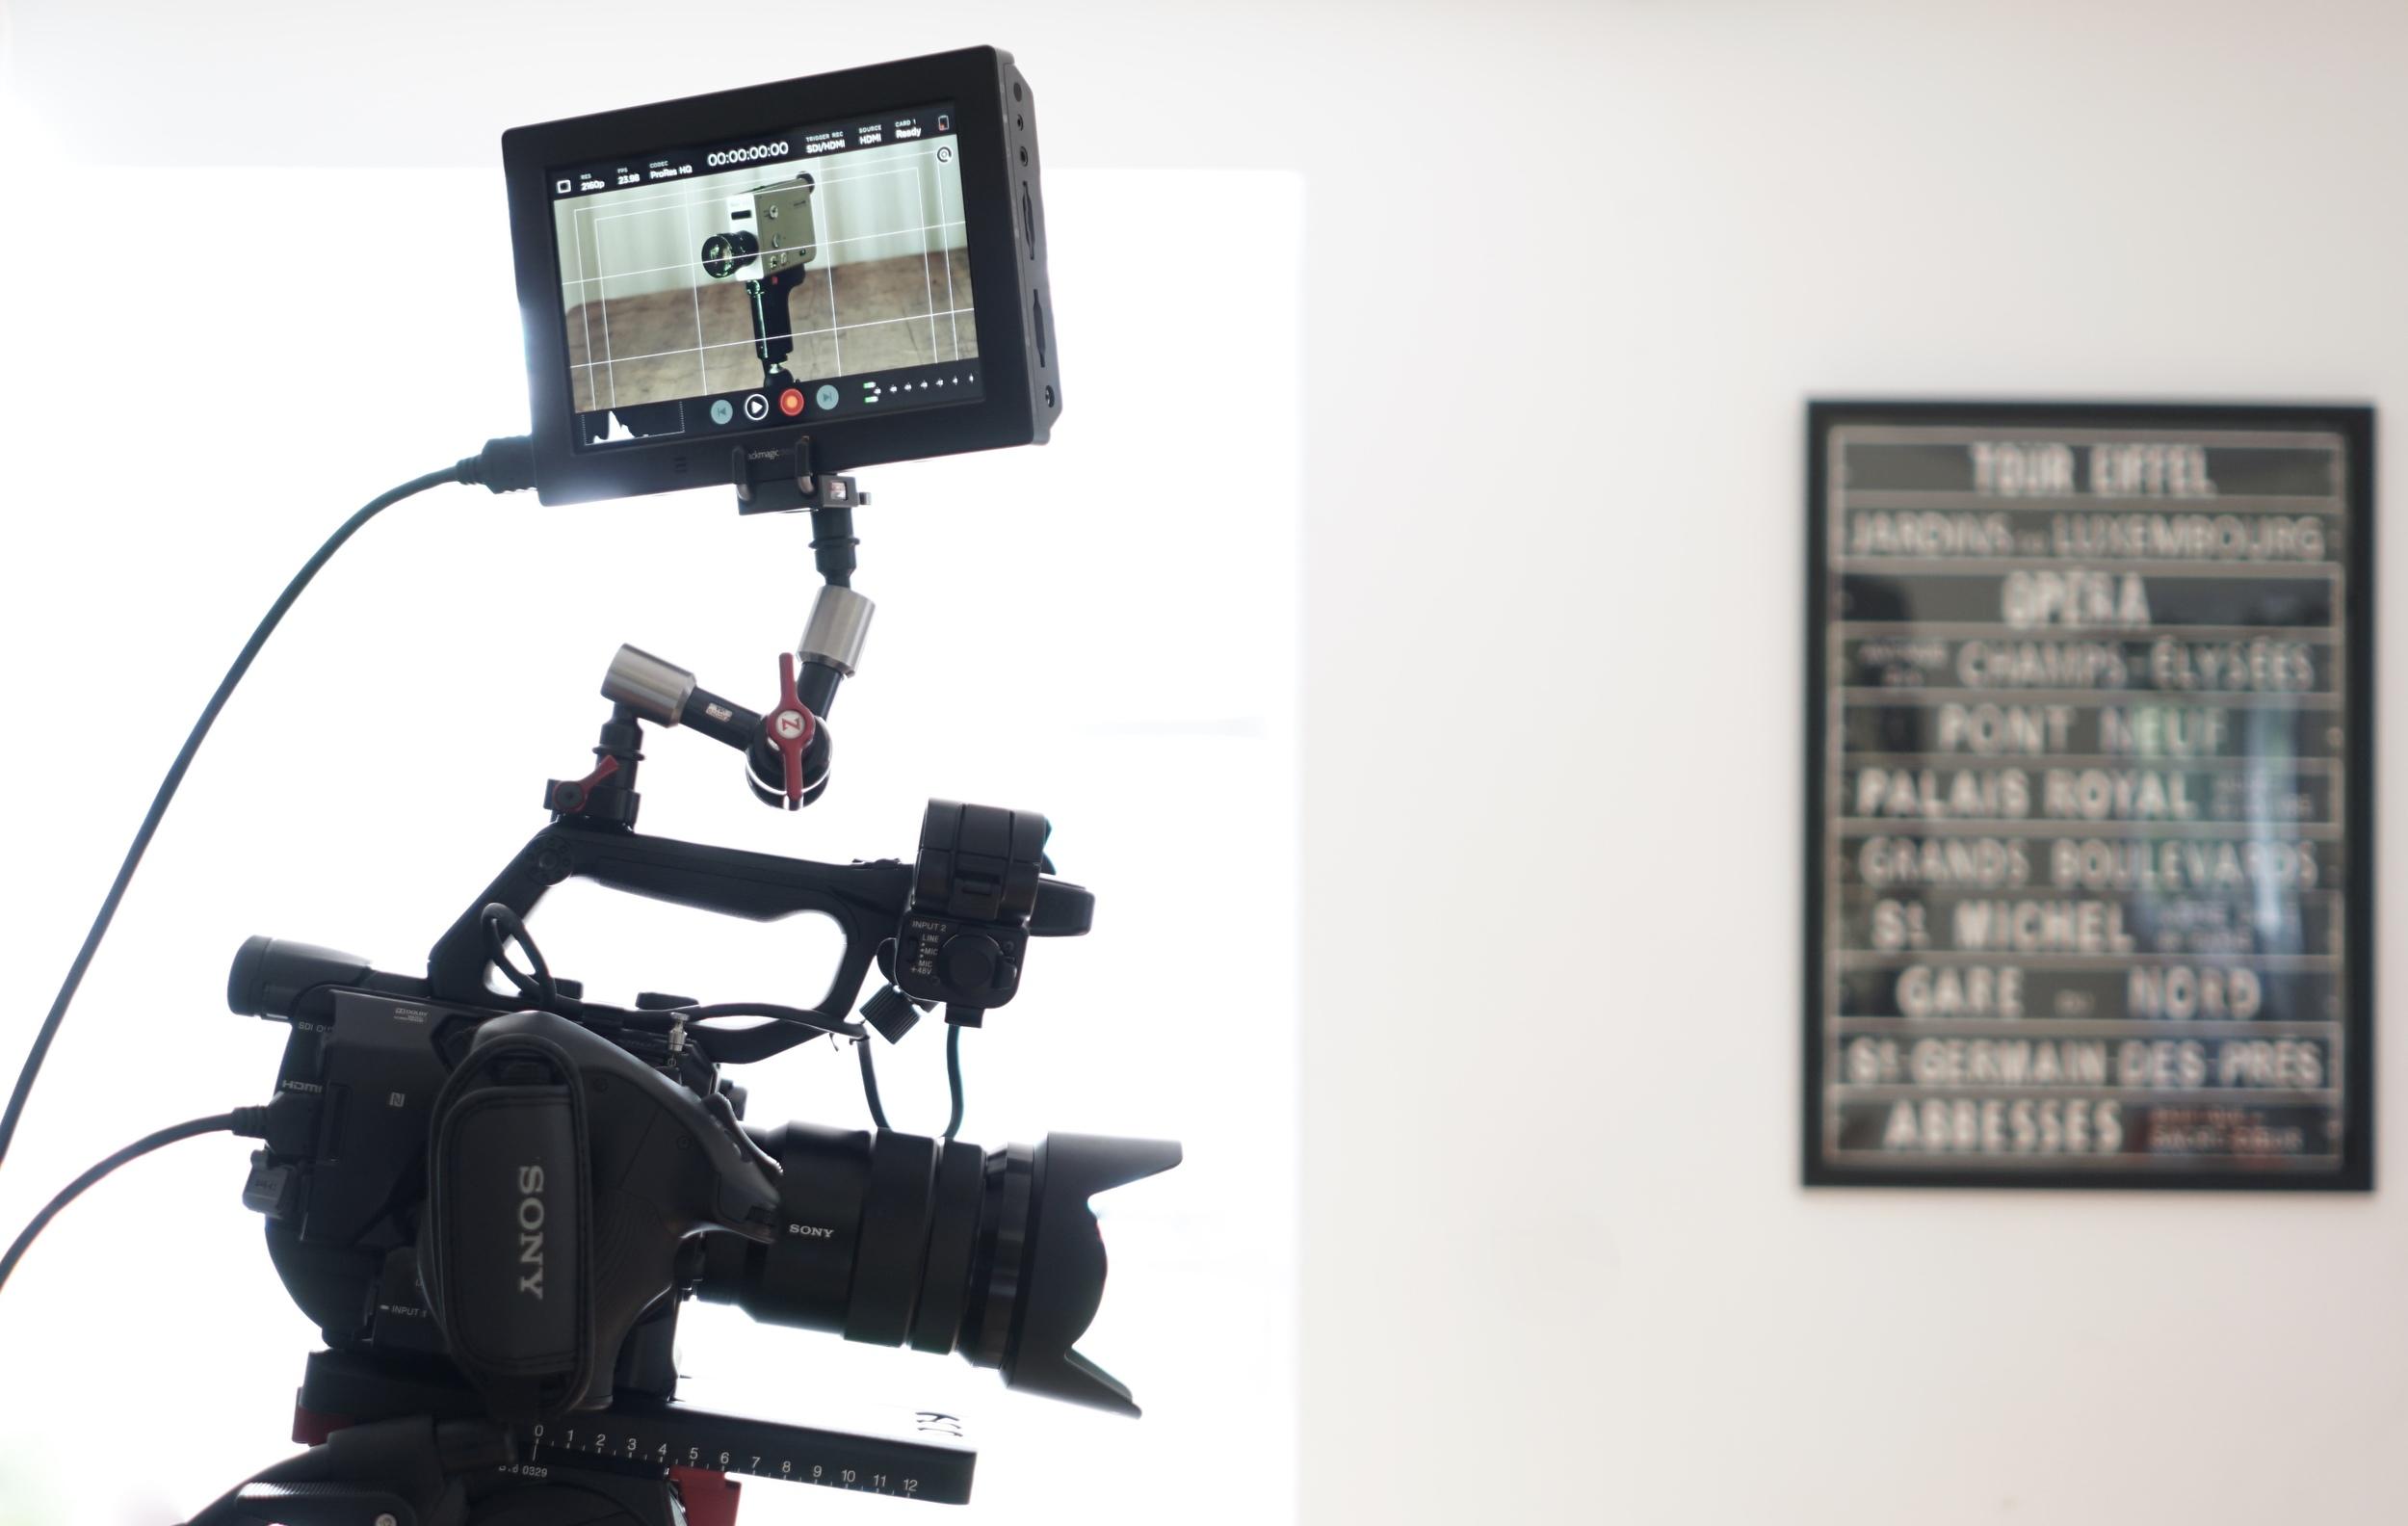 Blackmagic 4K Video Assist  mounted to  Sony FS5  via  Zacuto Zamerican Articulating Arm